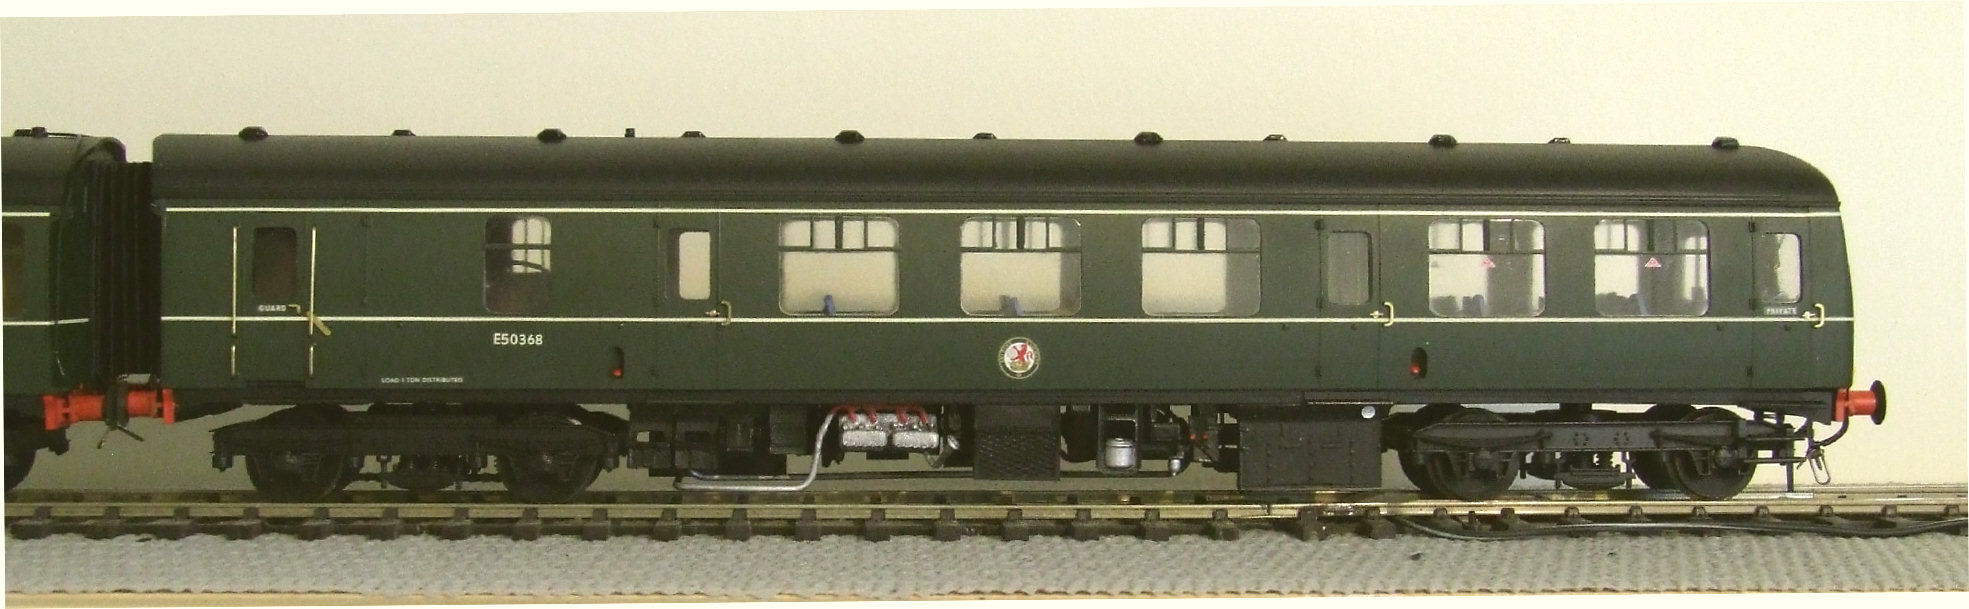 Easybuild Cravens Class 105 Dmu